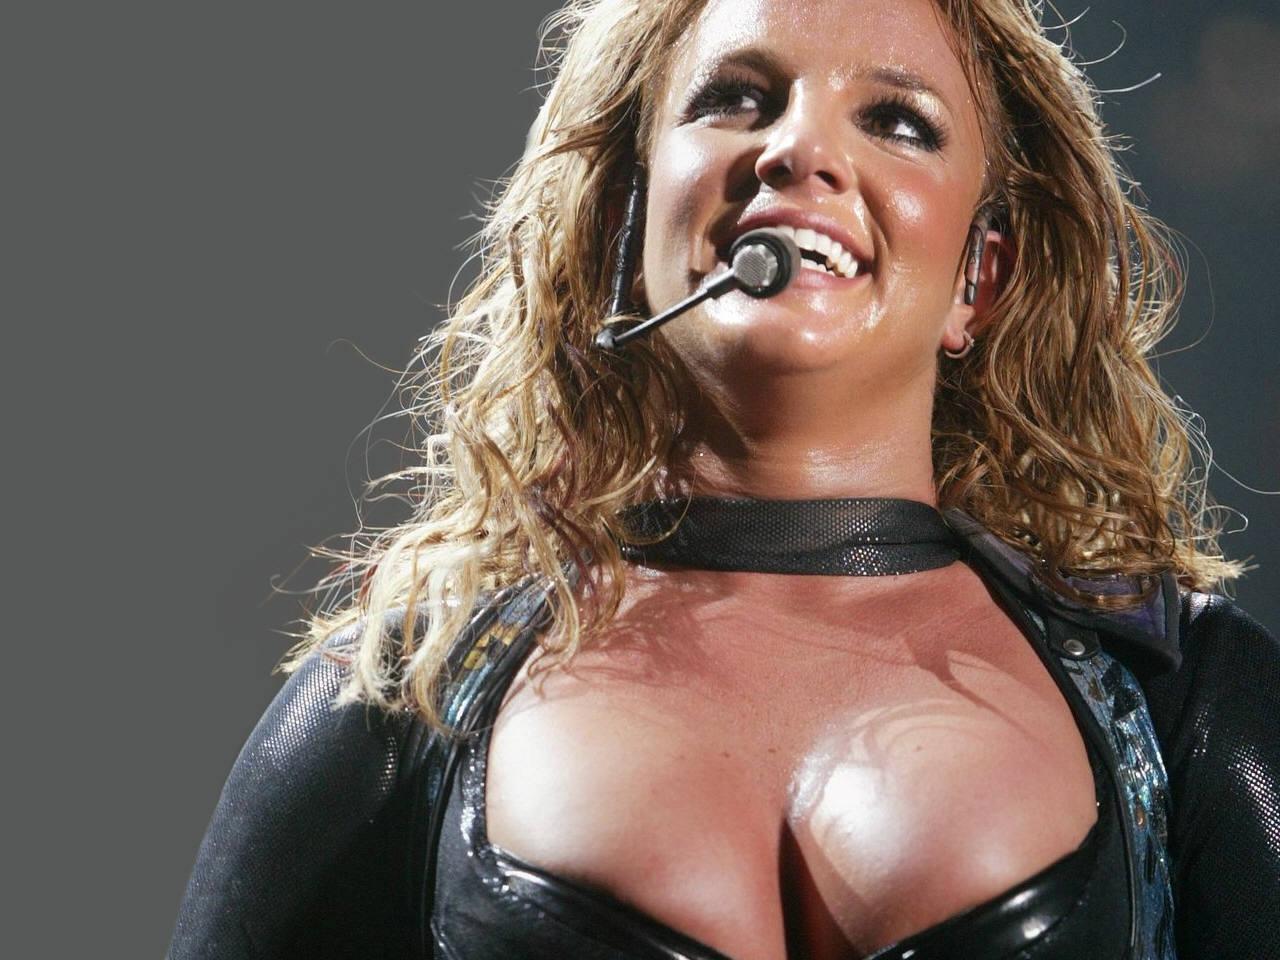 from Riley freee sex in girls nipple